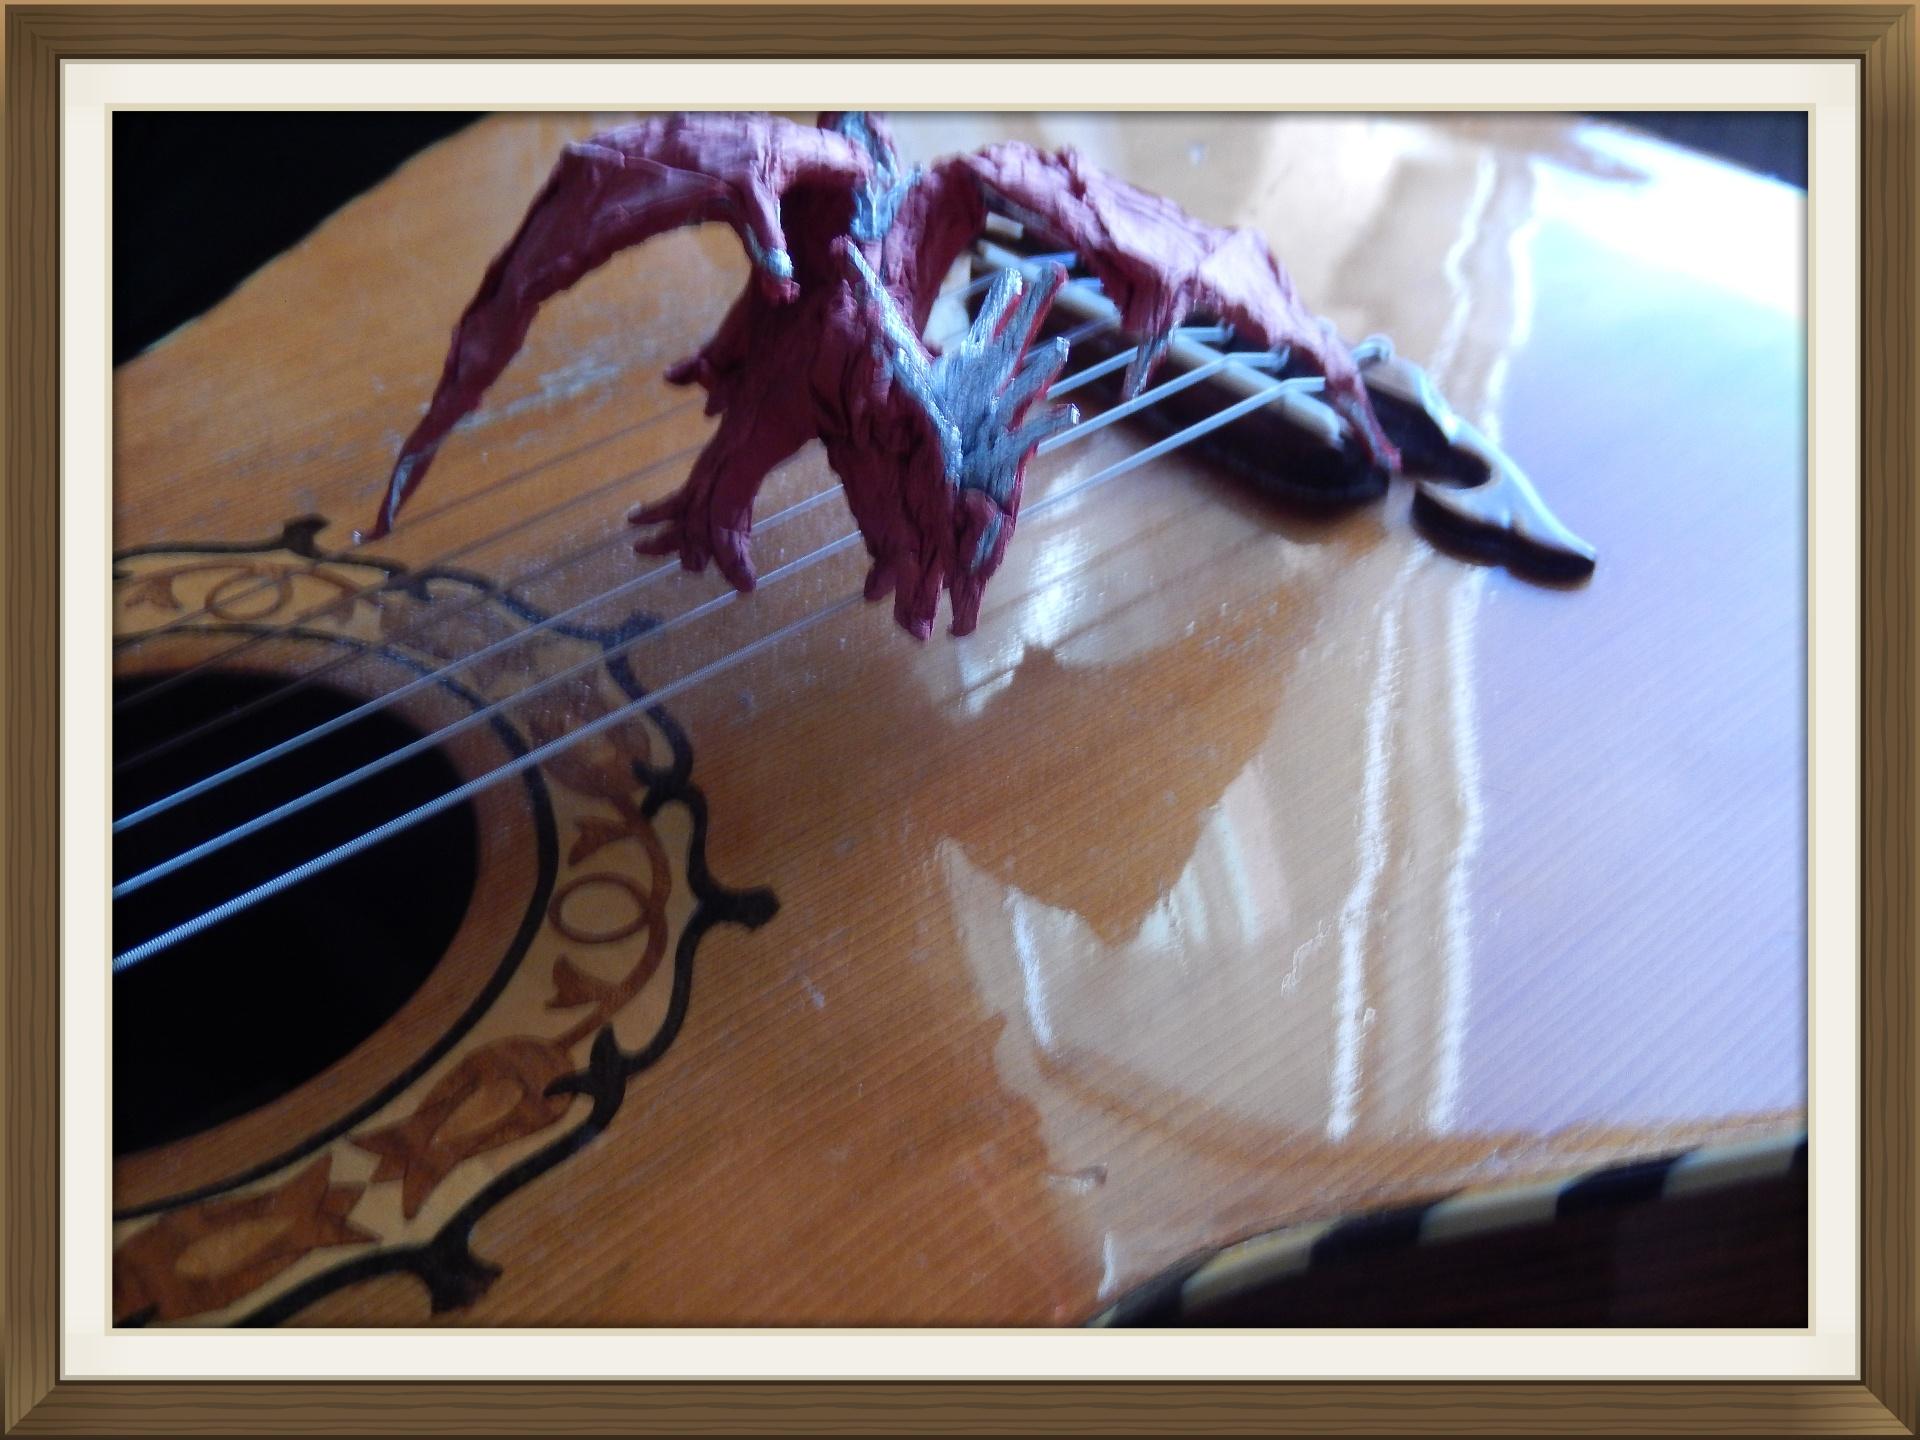 Facebook Bill Mann PhD. Guitar Lessons West Bridgford Nottingham